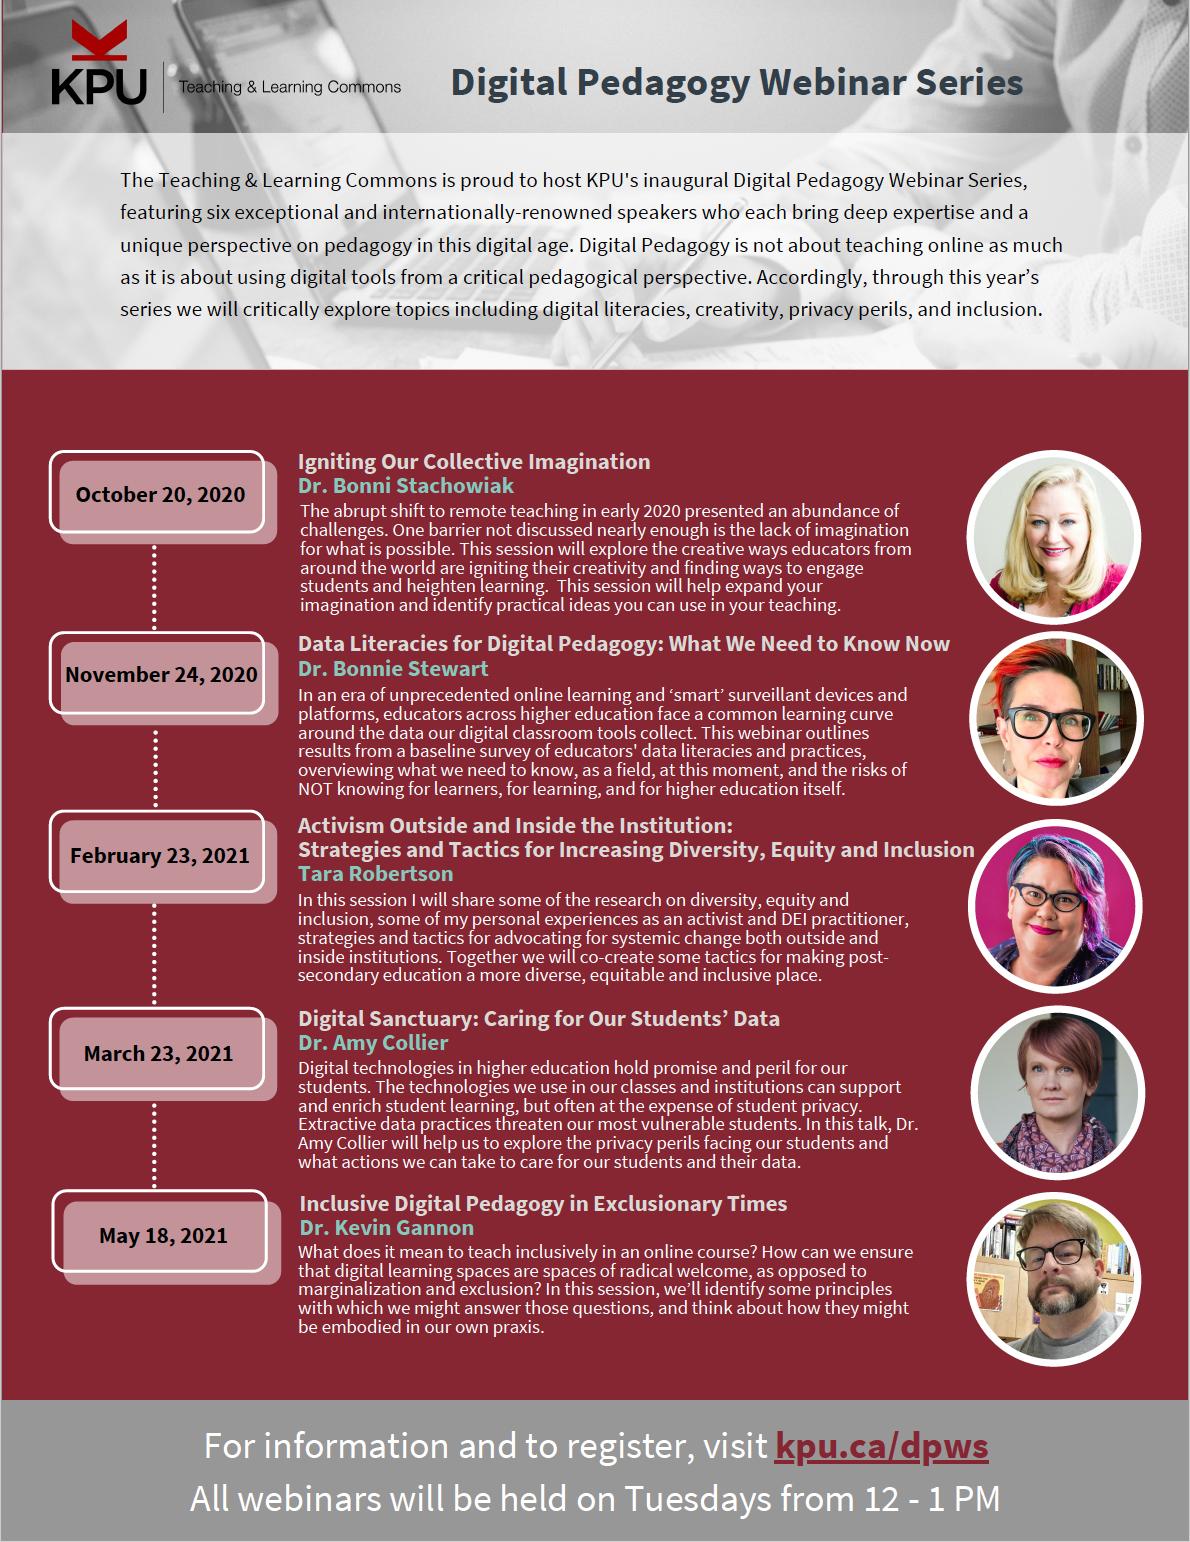 Digital Pedagogy Webinar Series Flyer